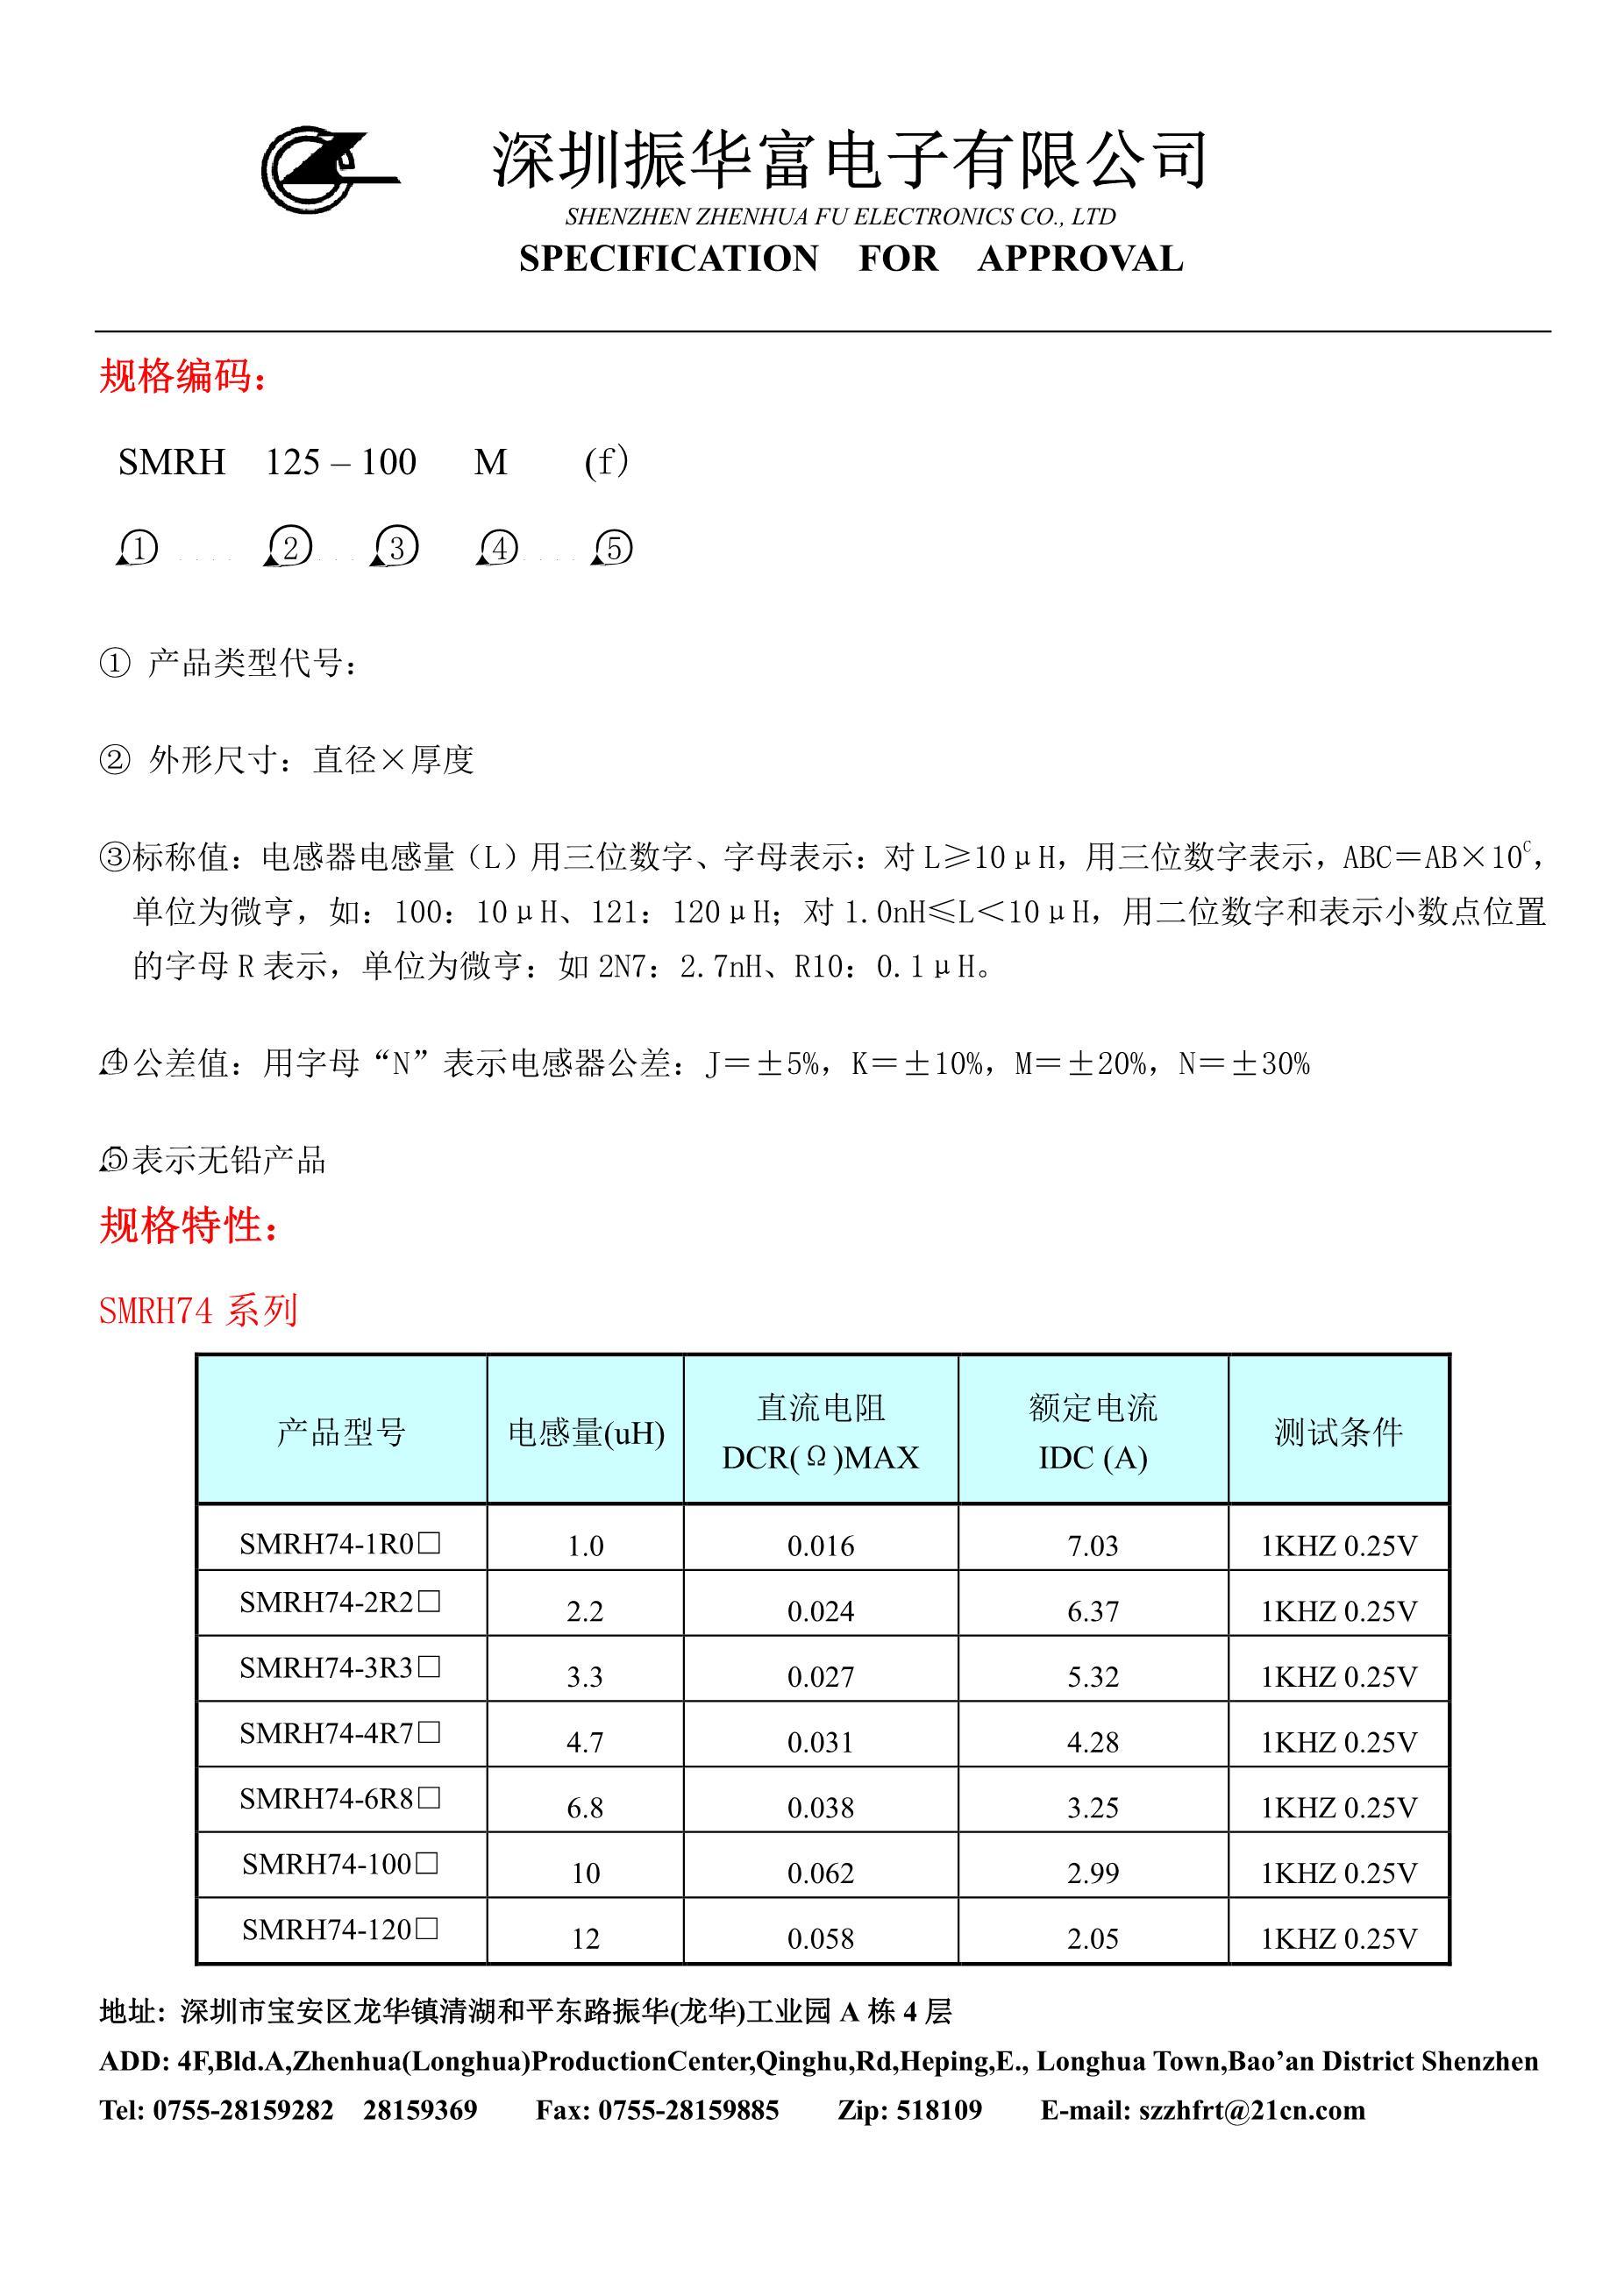 100N03LT's pdf picture 3